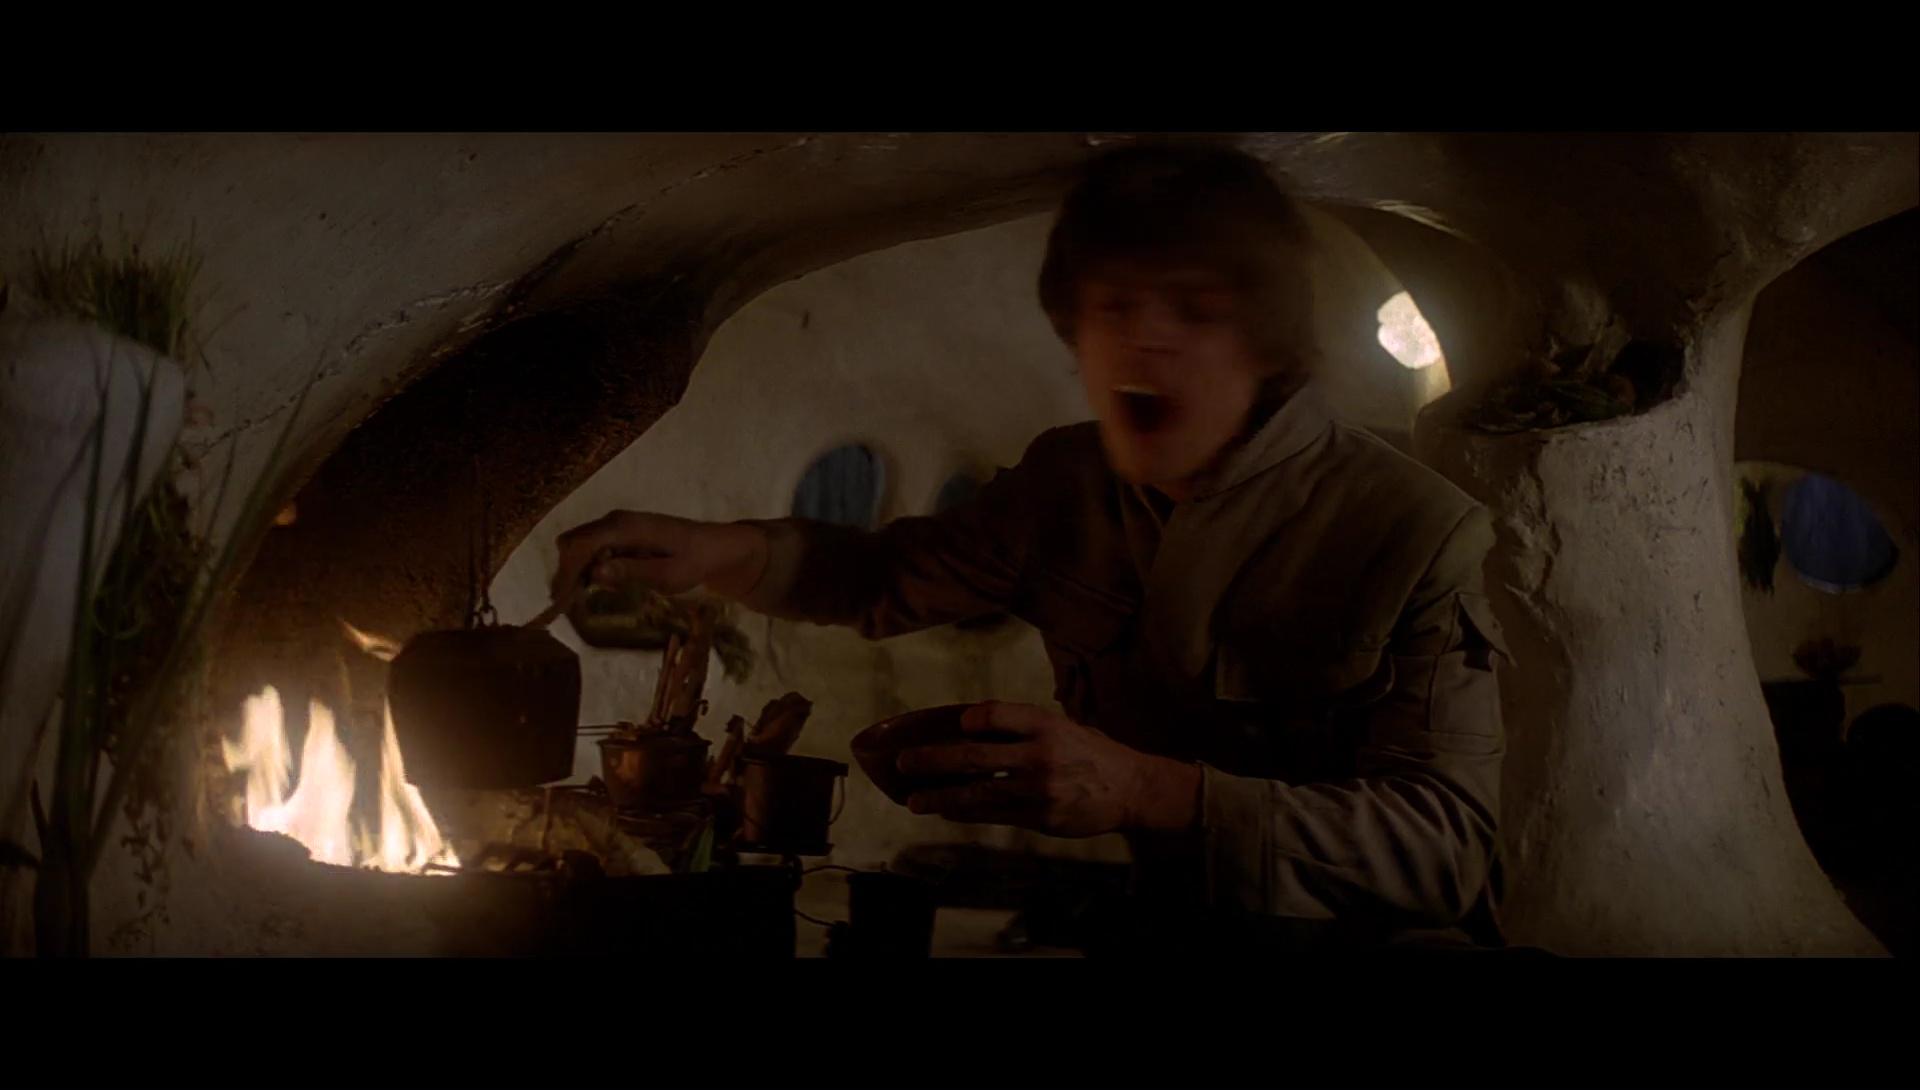 Star Wars Episodio V El Imperio Contraataca 1080p Lat-Cast-Ing 5.1 (1980)